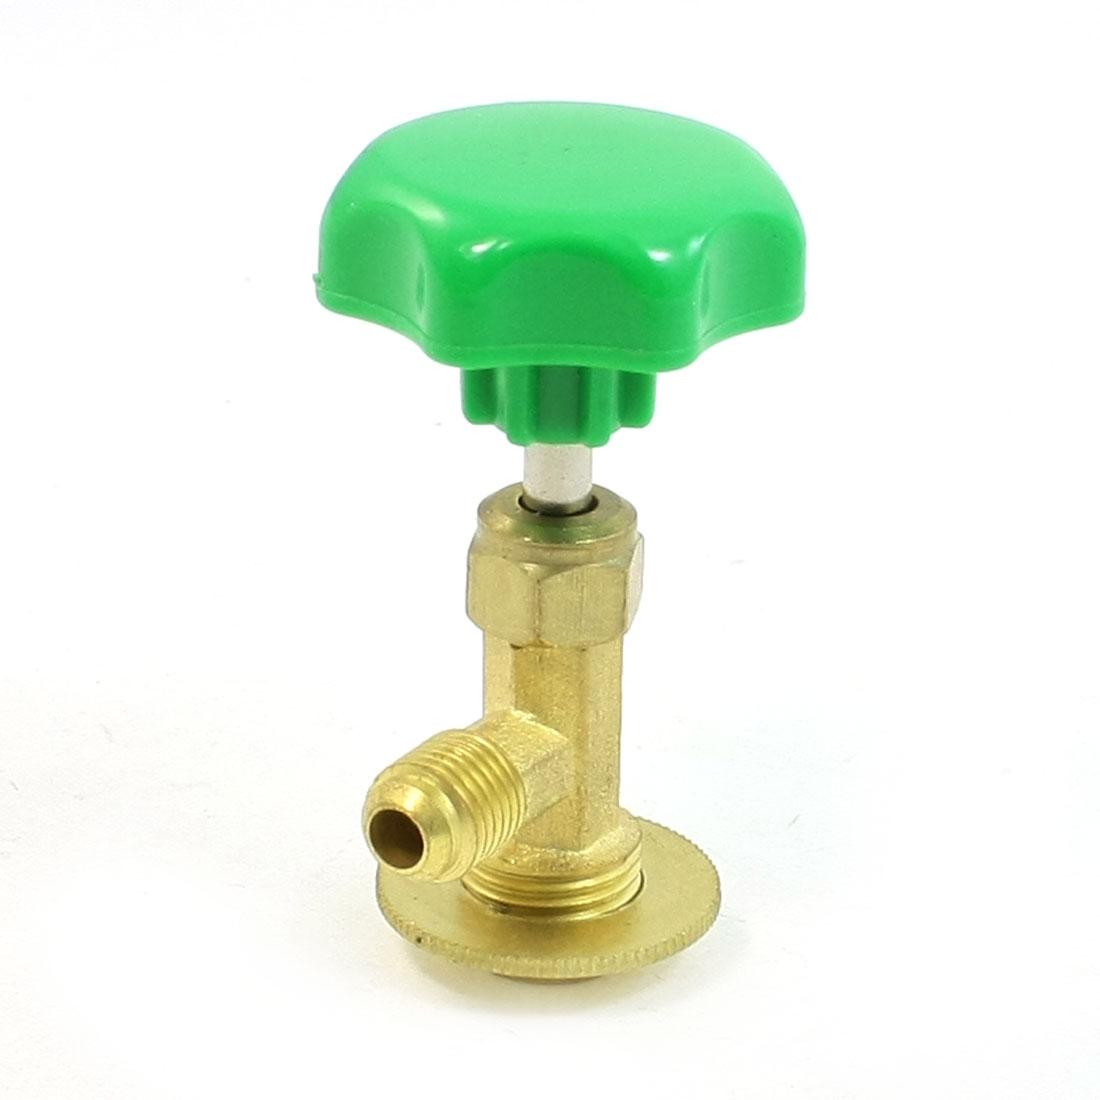 Green Cap Refrigerant Brass Threaded Connetor R12 Can Tap Valve Opener